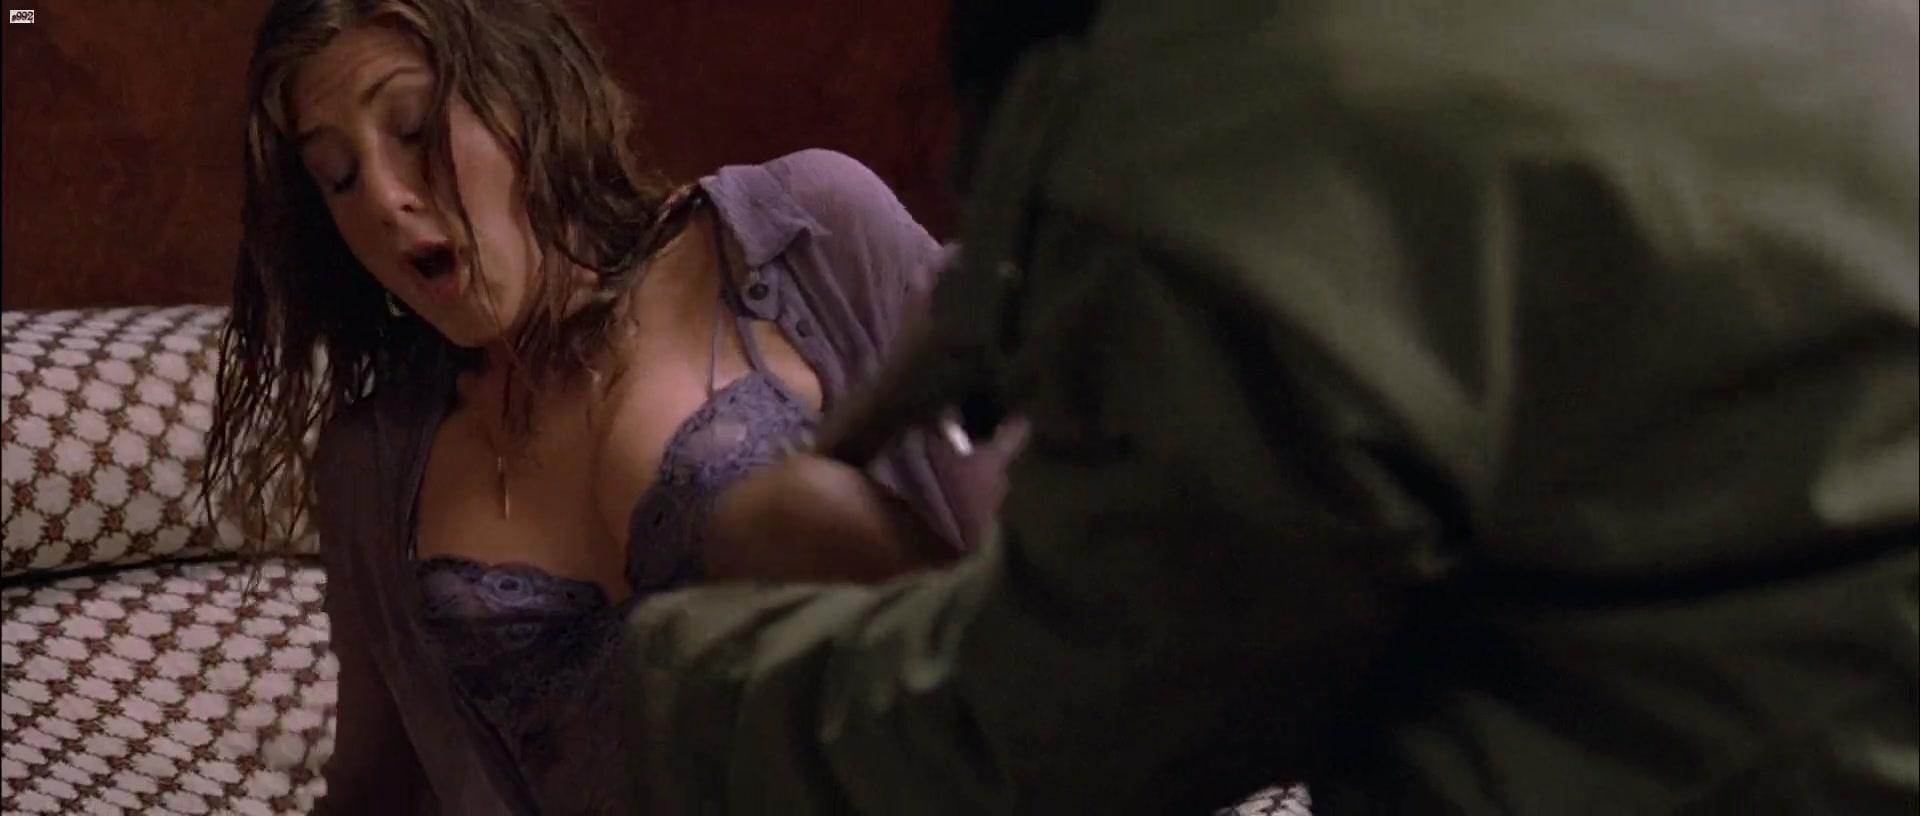 Selena gomez fake moving porn pics